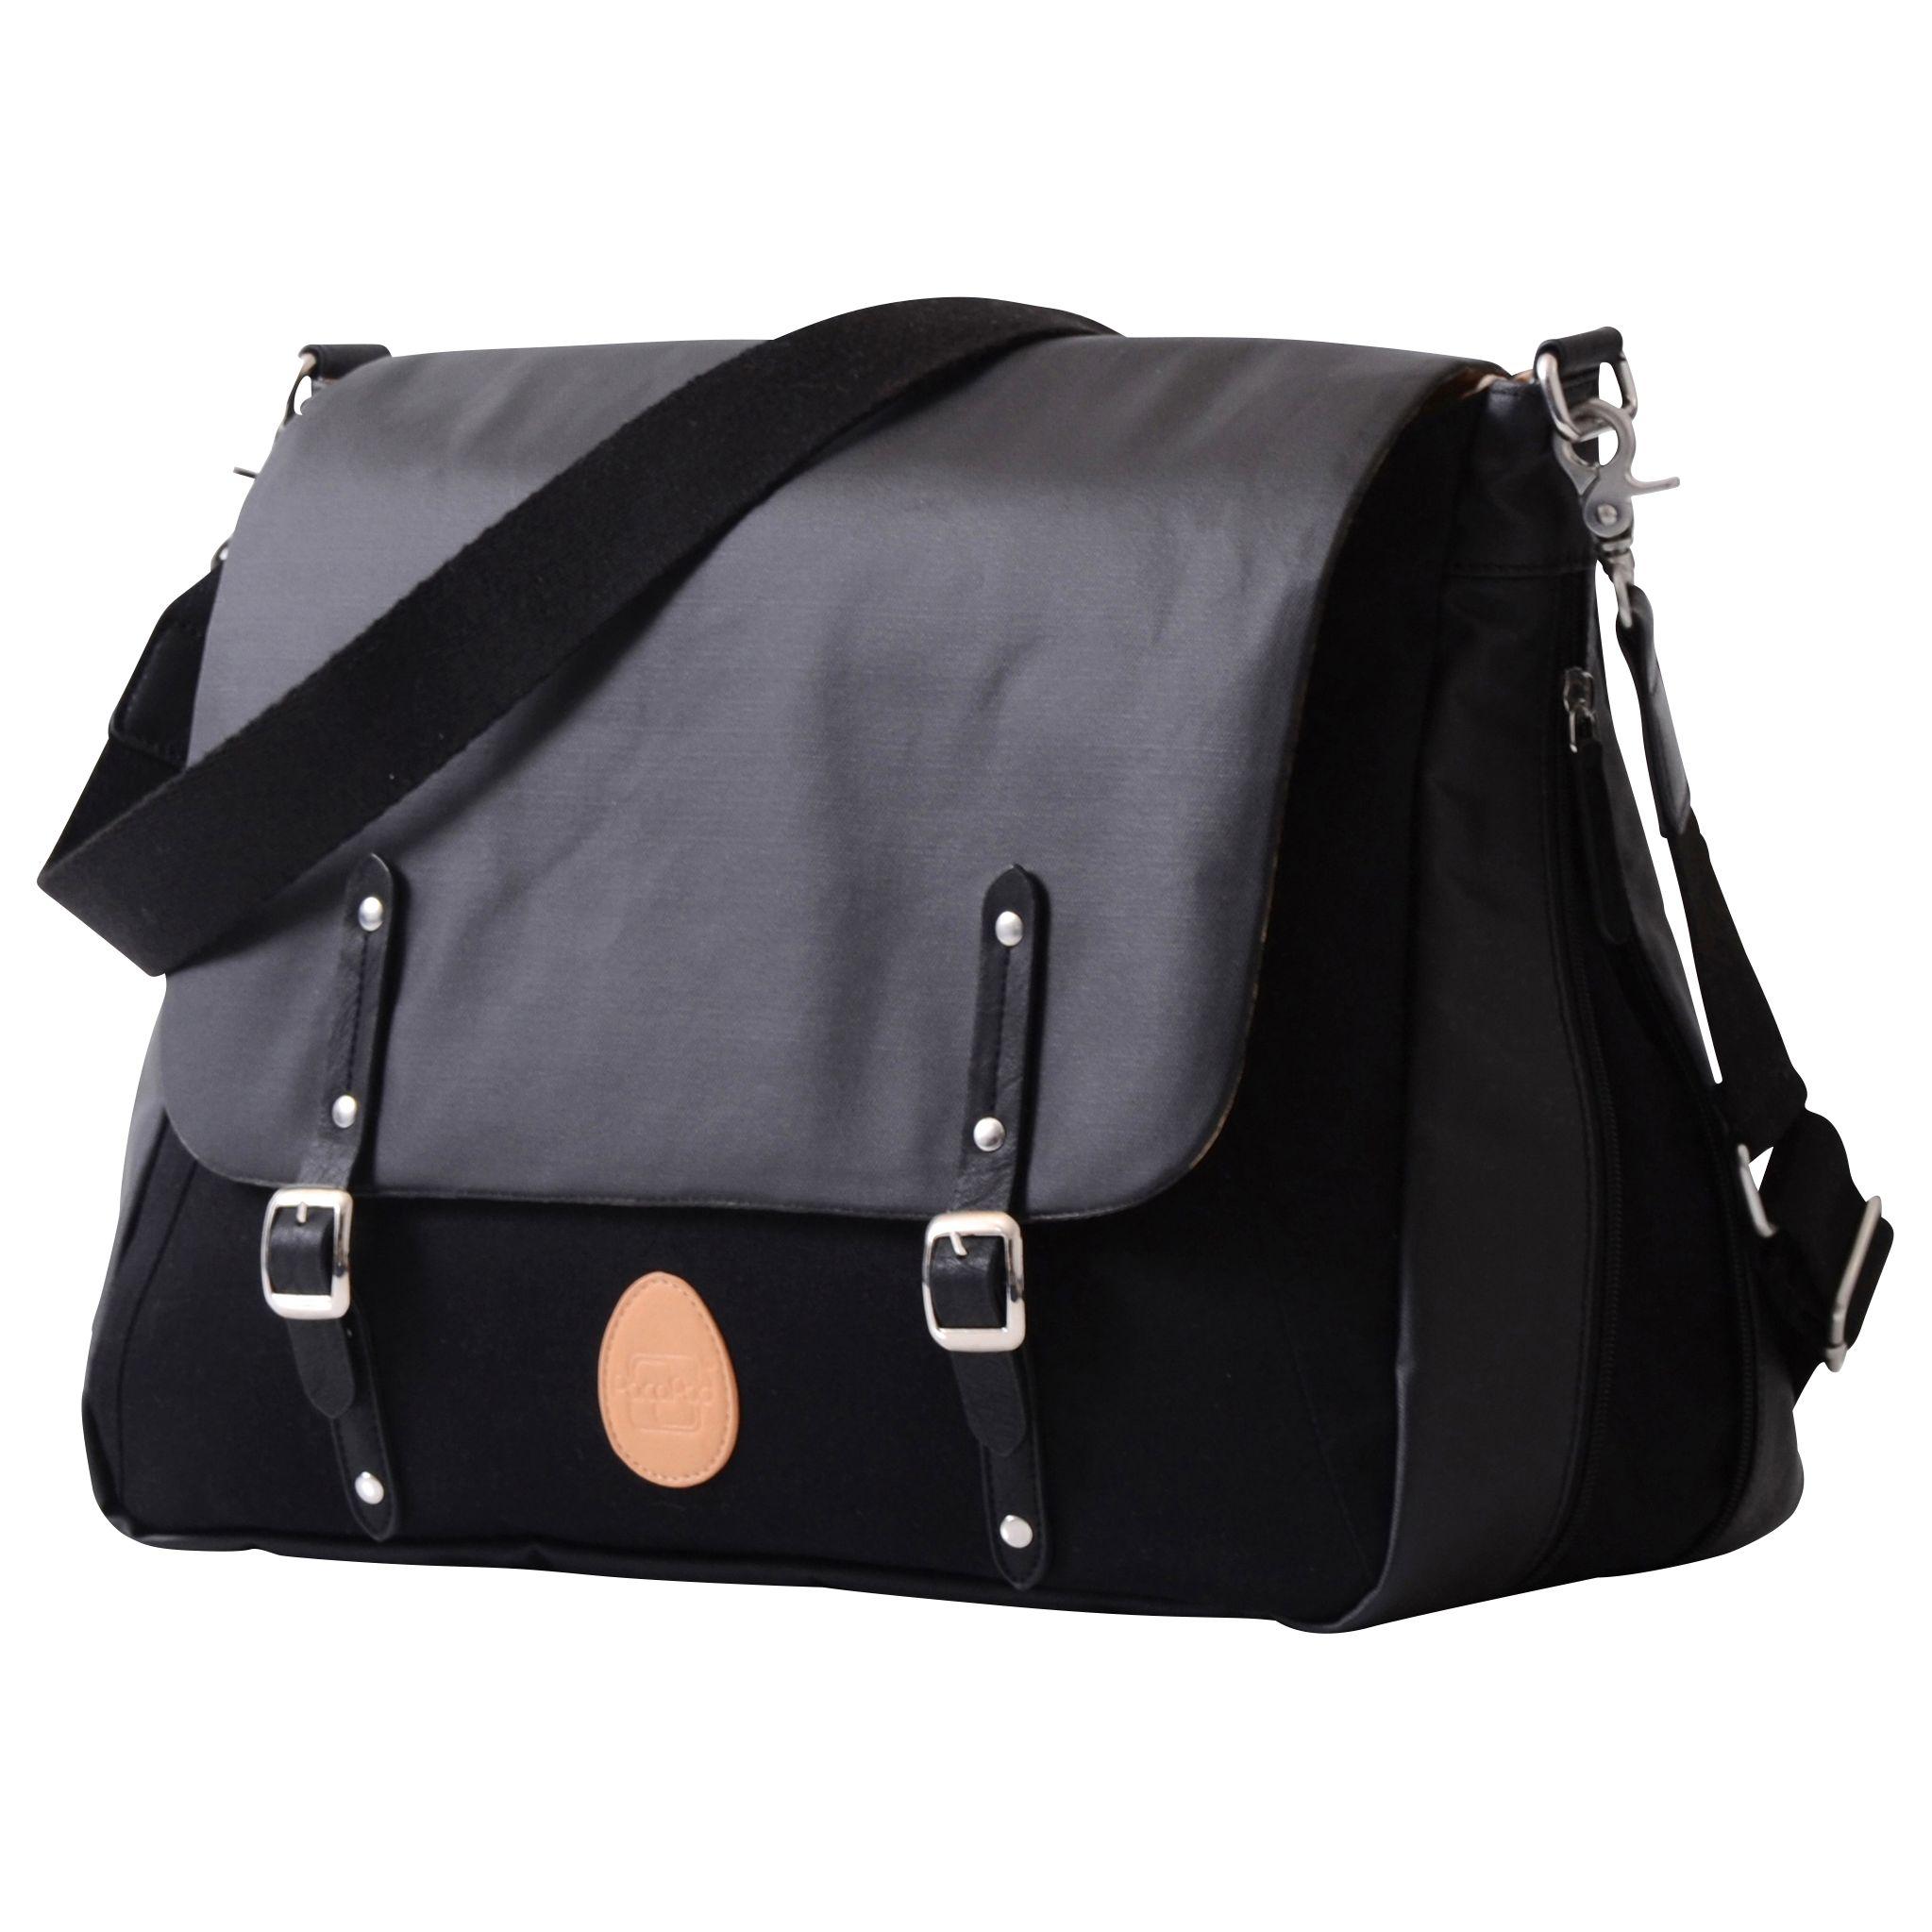 PacaPod PacaPod Prescott Changing Bag, Black